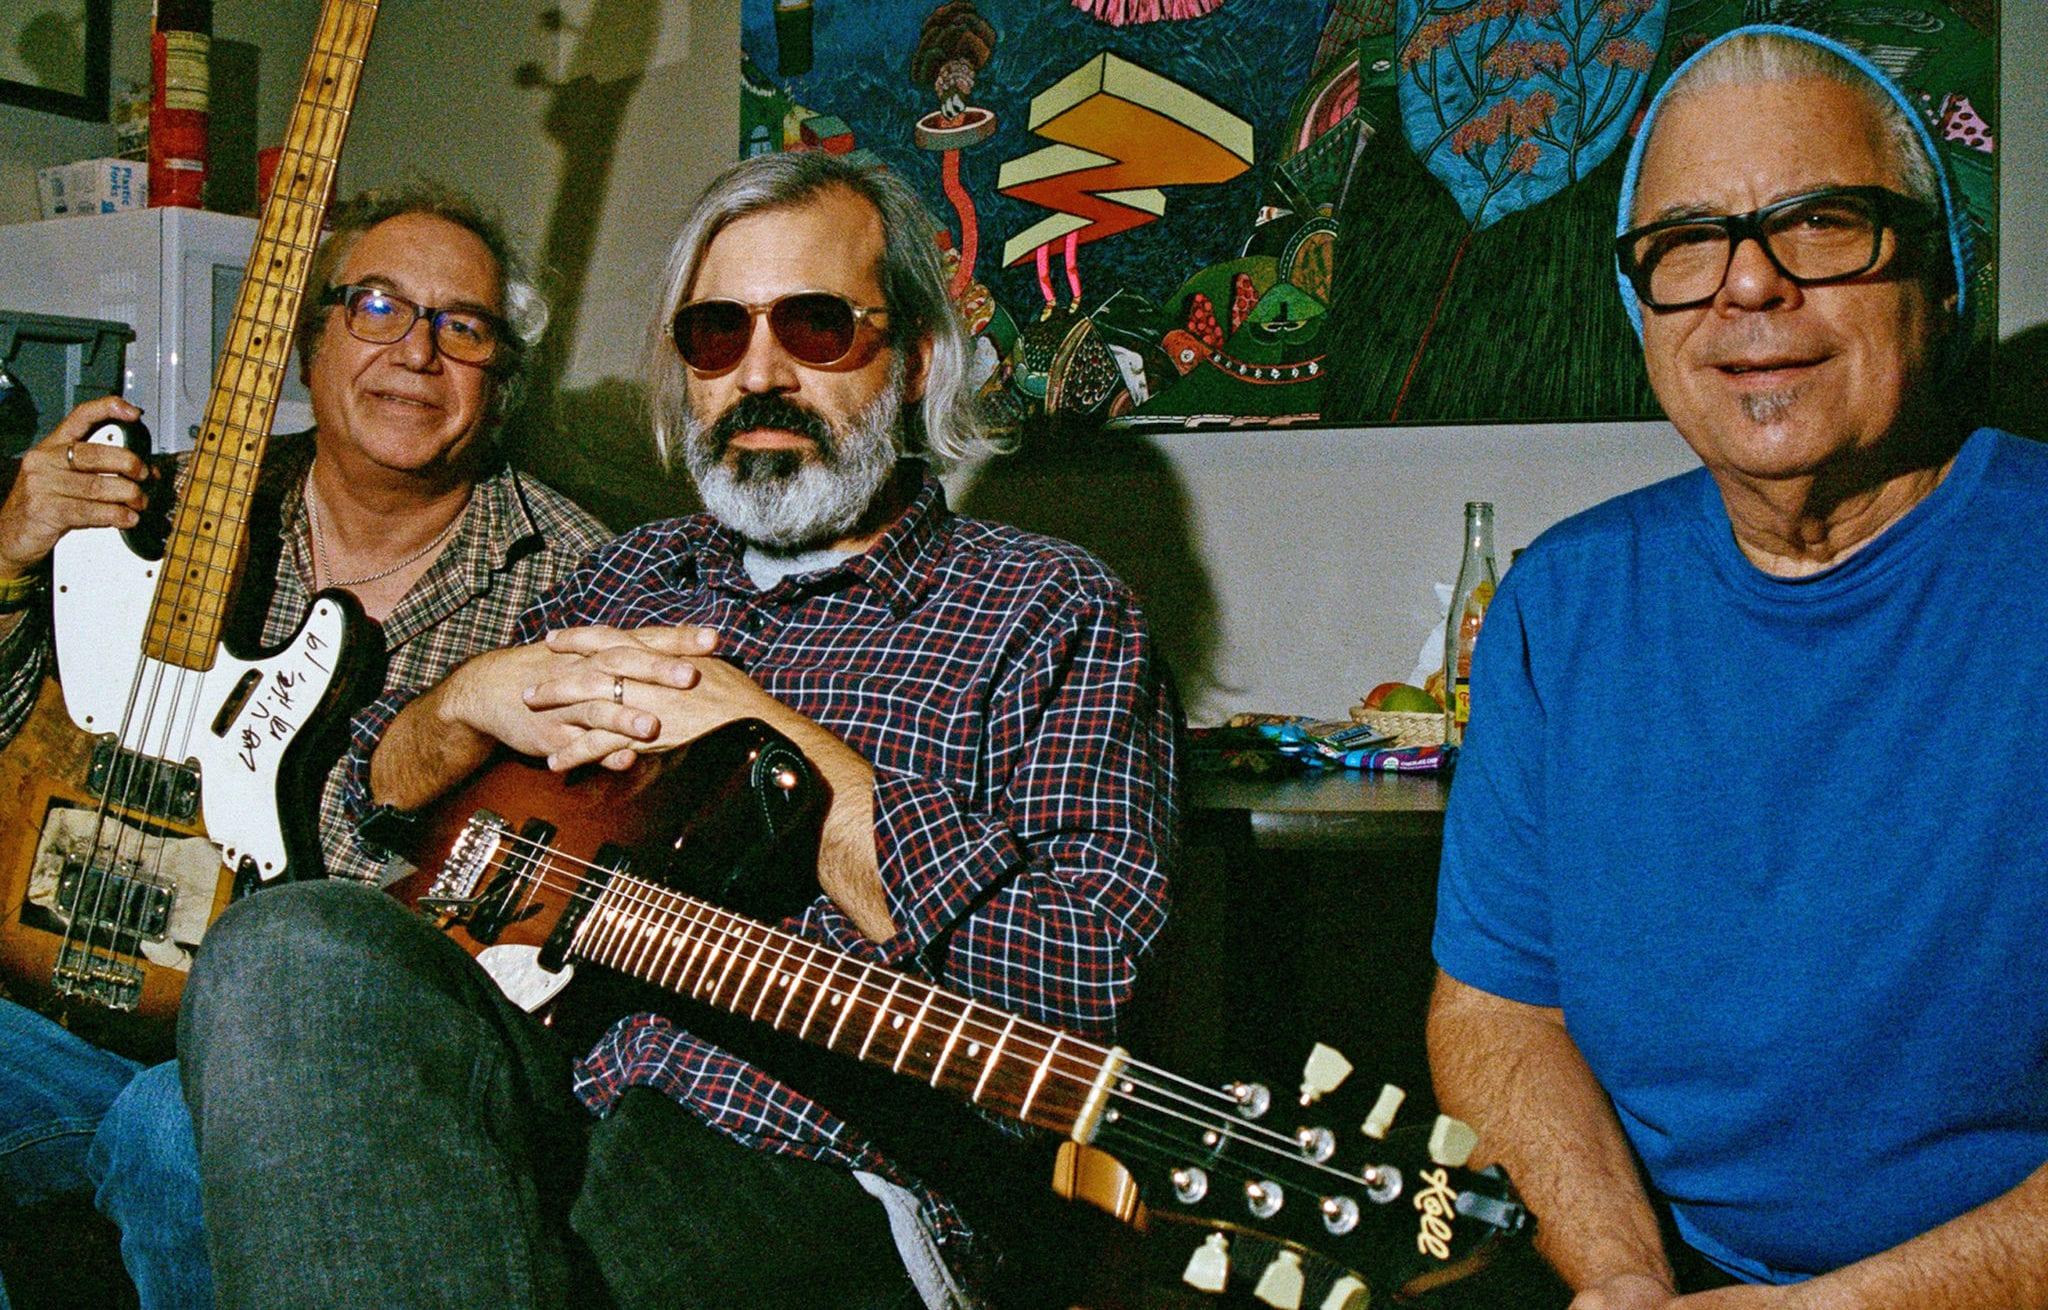 MSSV (Mike Baggetta, Stephen Hodges, Mike Watt)